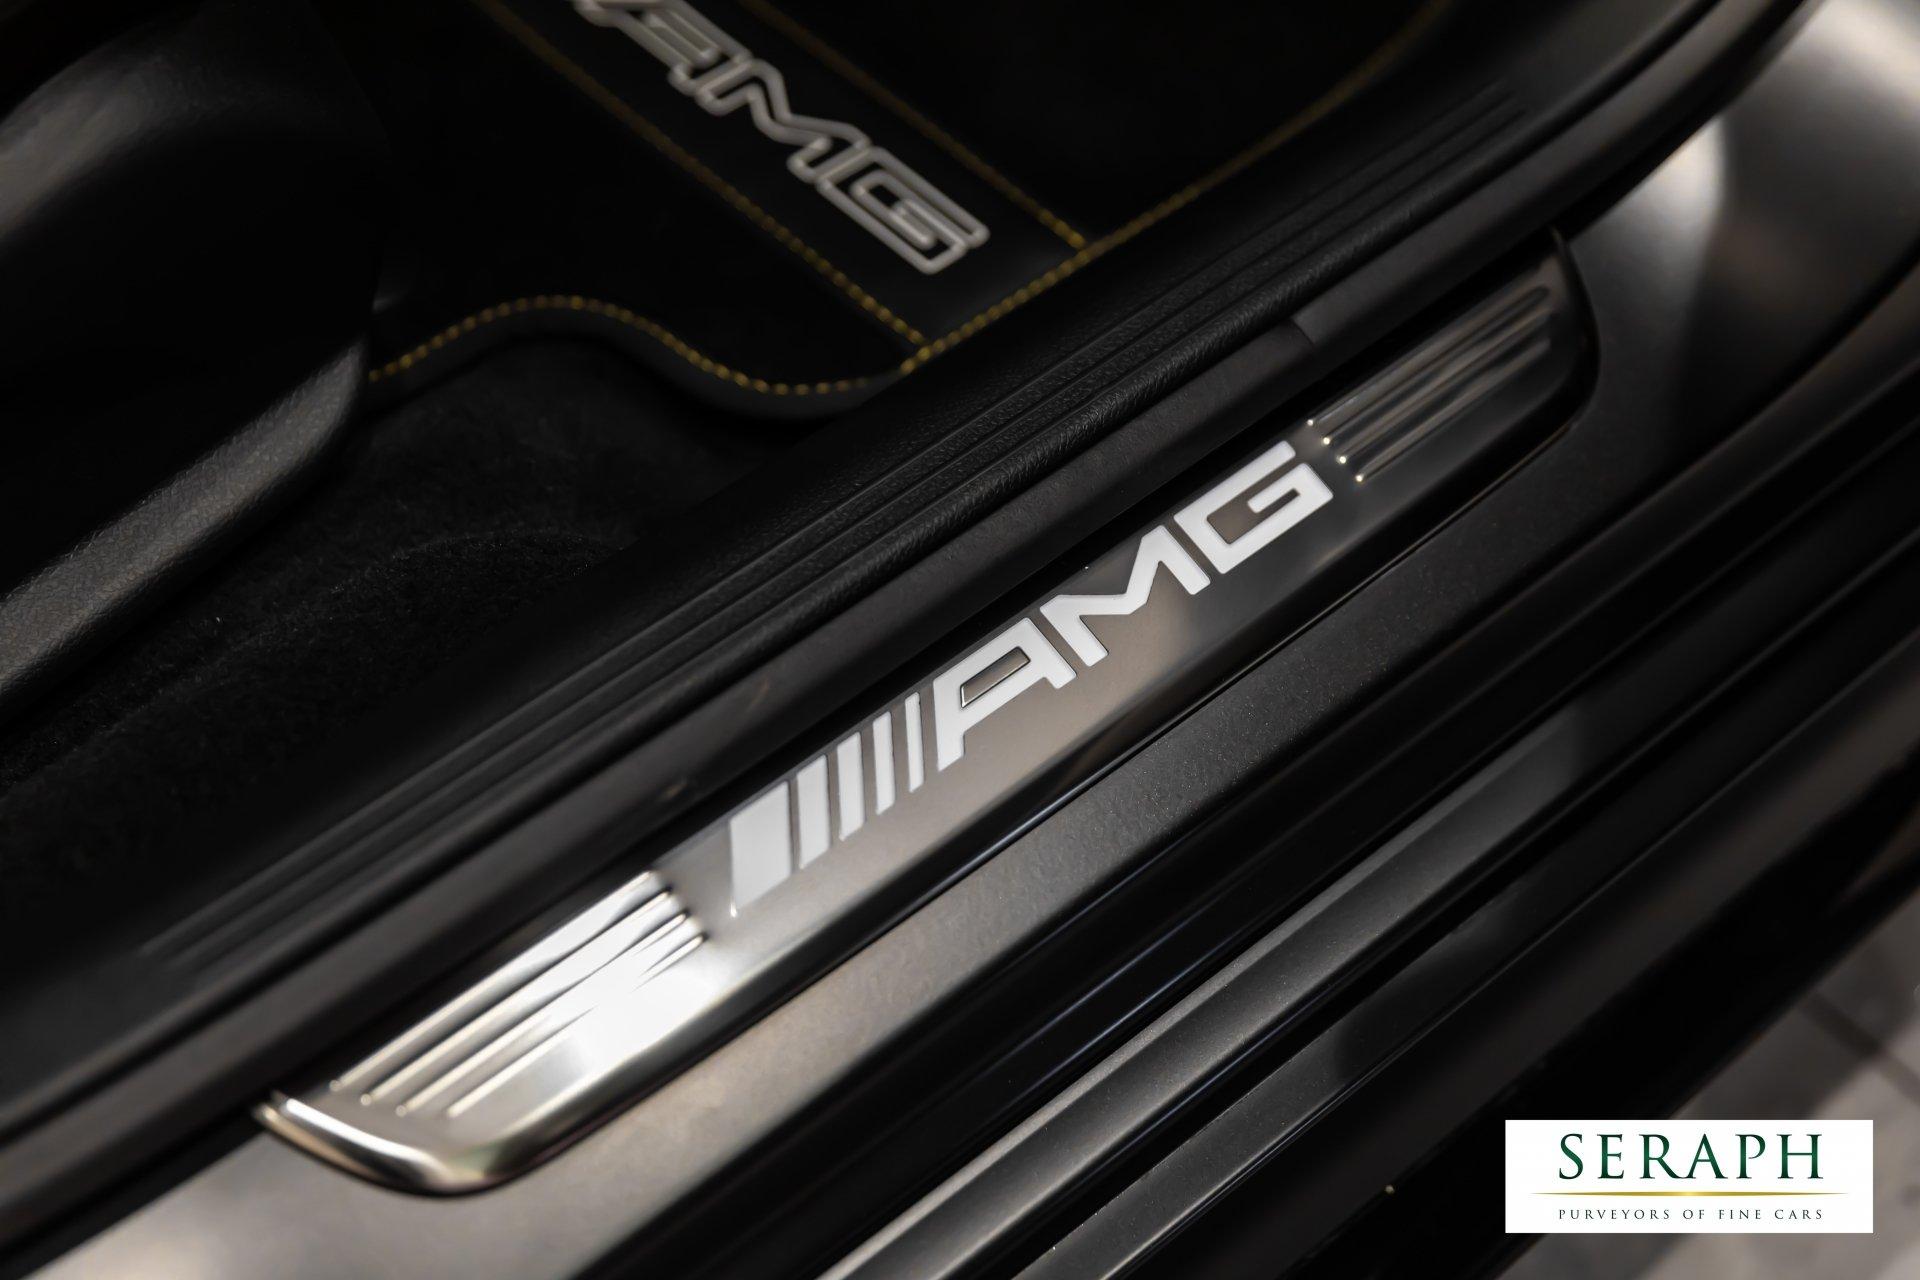 2019 (69) Mercedes AMG GT 63 S 4.0 Bi Turbo 4Matic